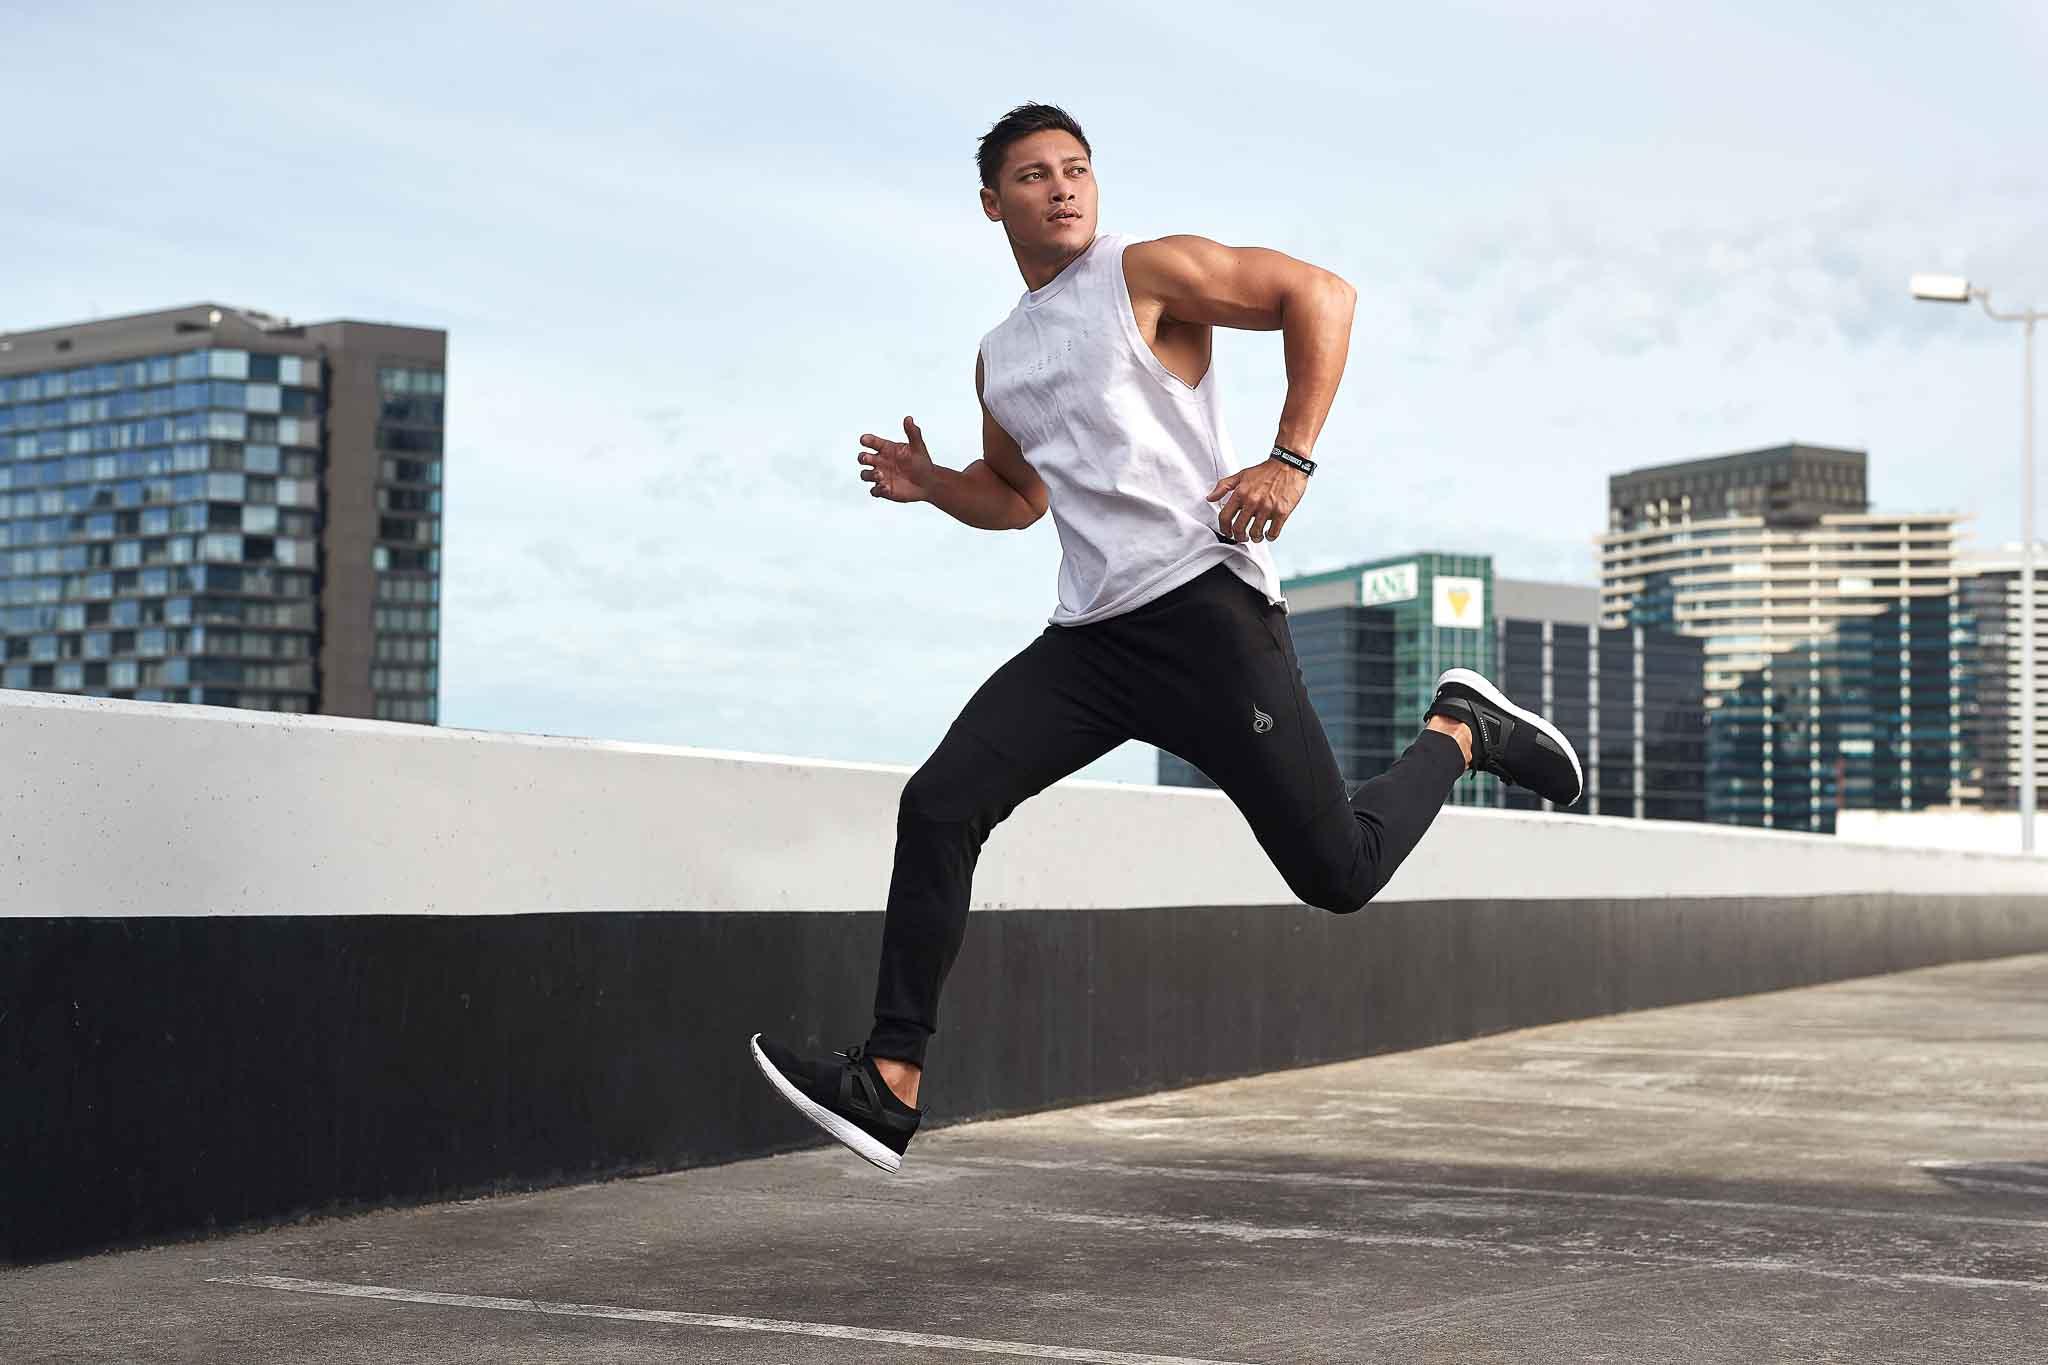 Andrew Mc Darwins leading male fitness model running through car park